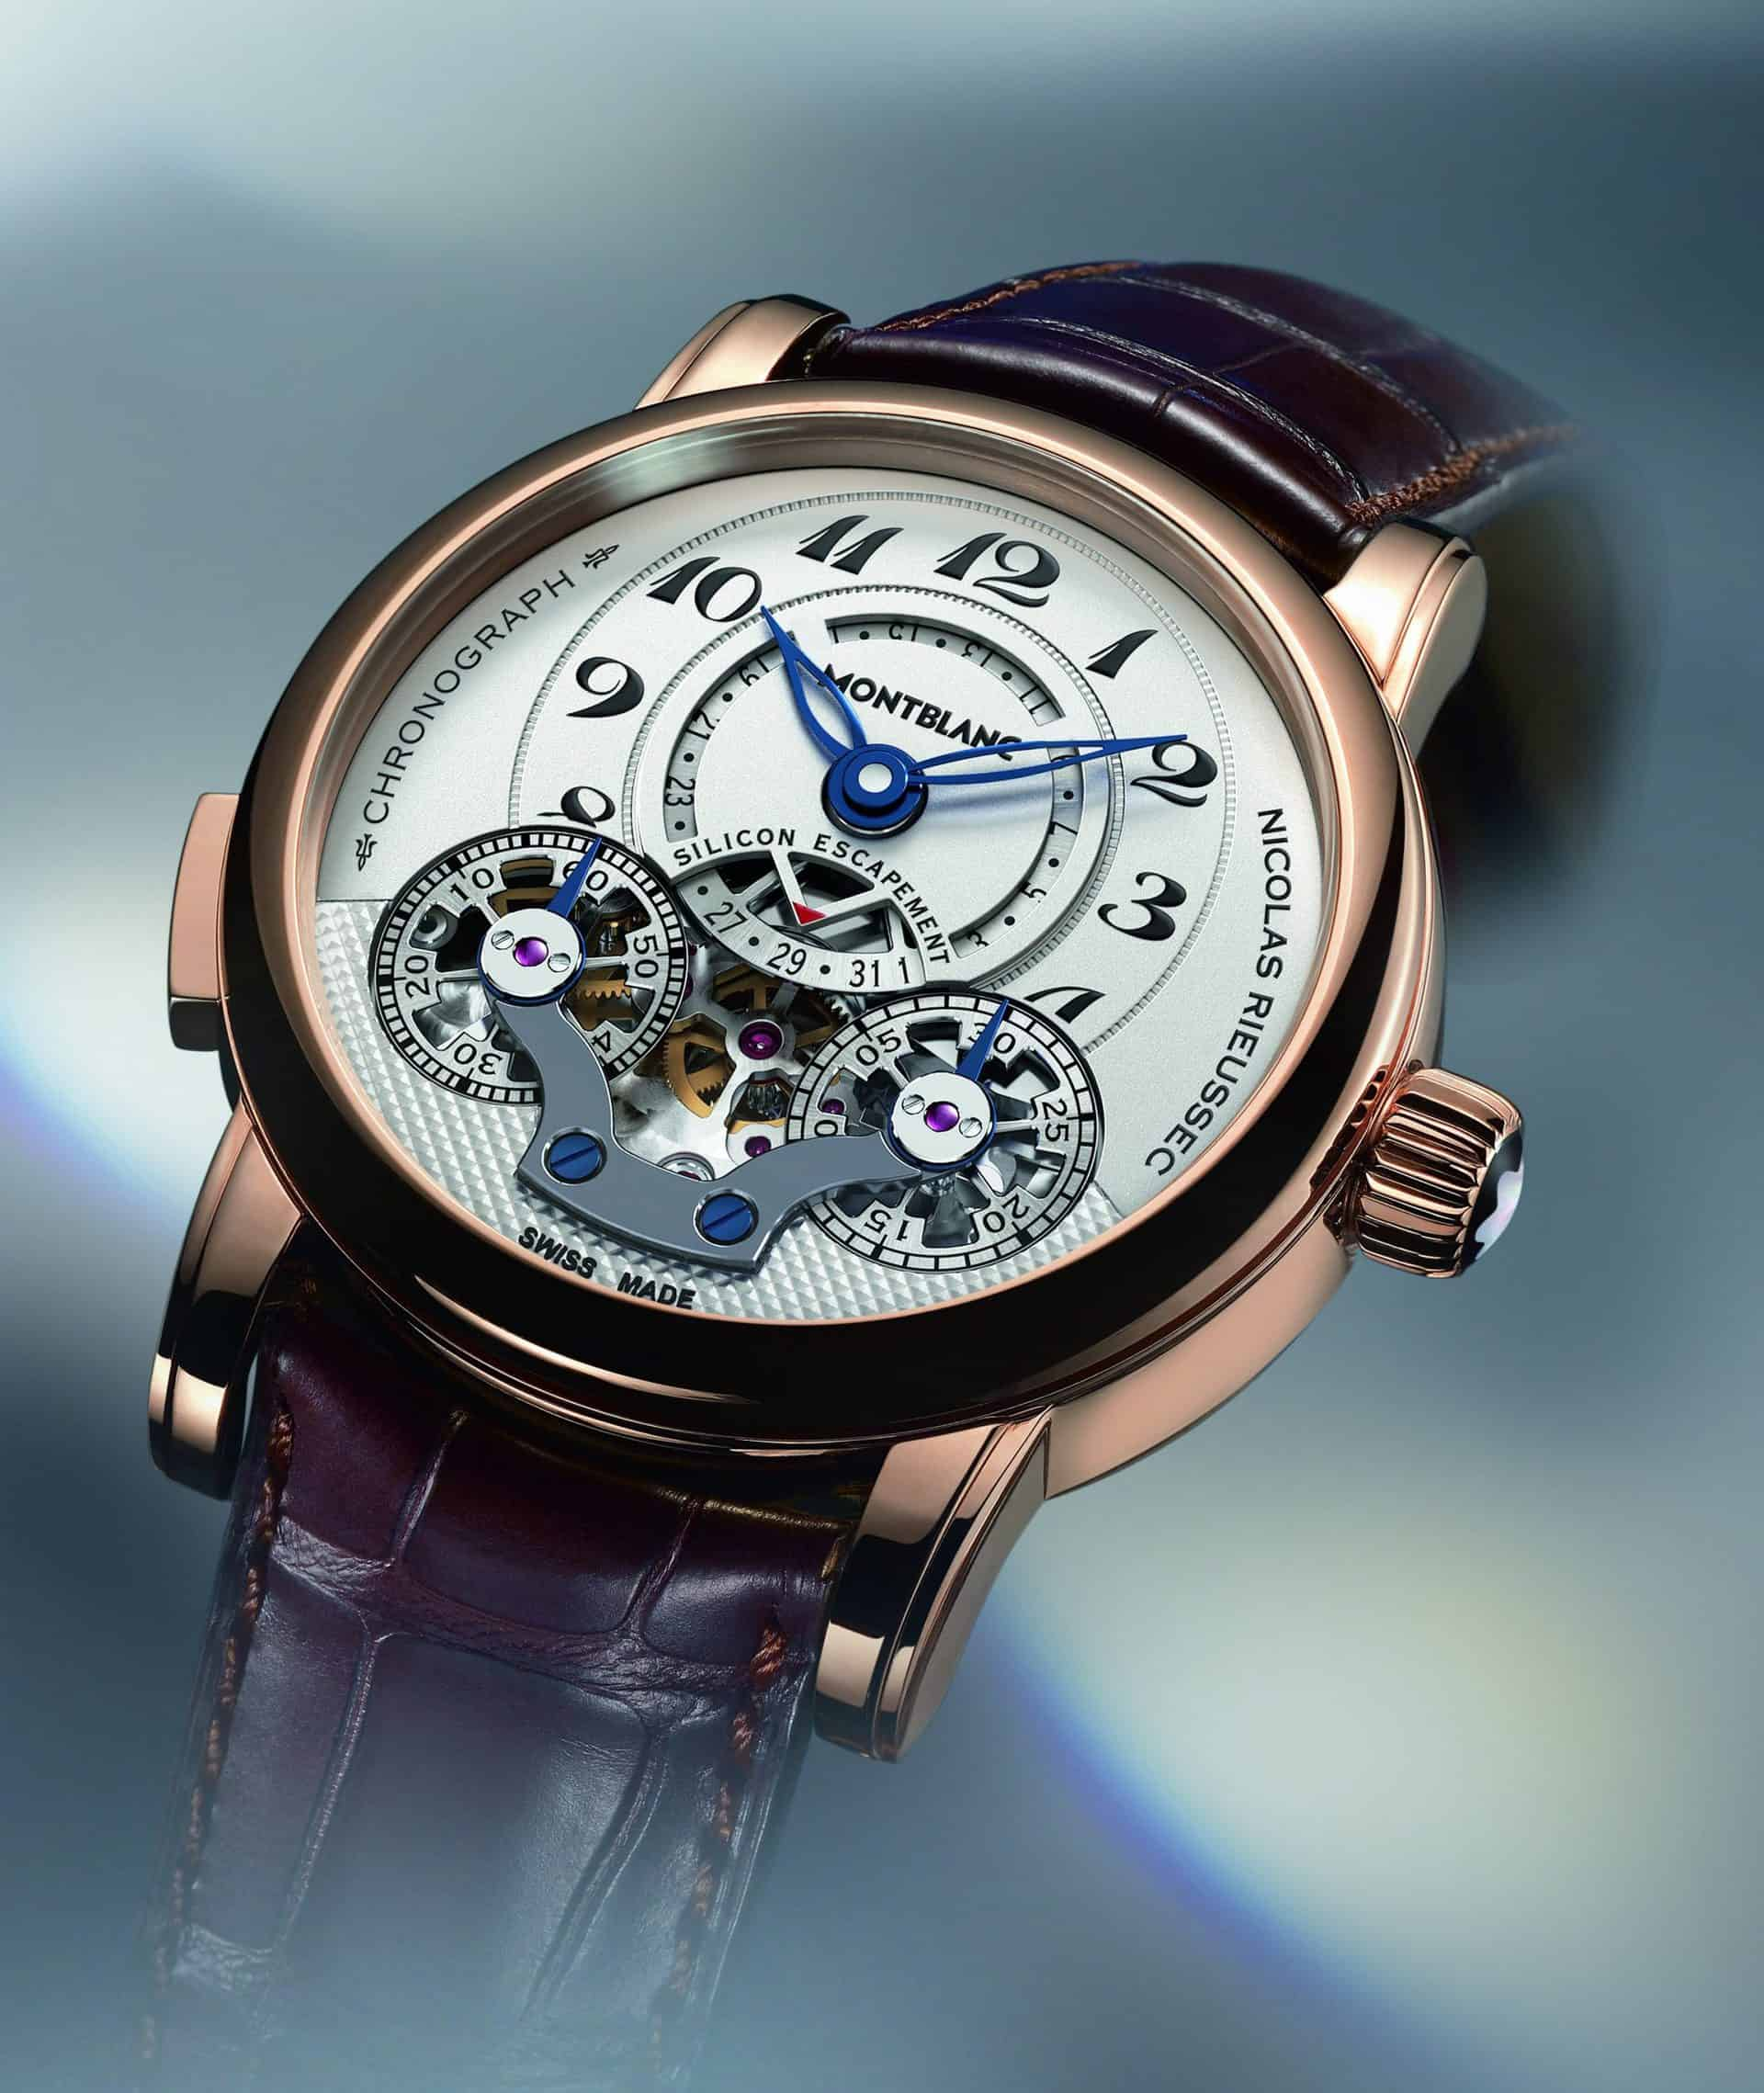 Montblanc Nicolas Rieussec Monopusher Chronograph Handaufzug